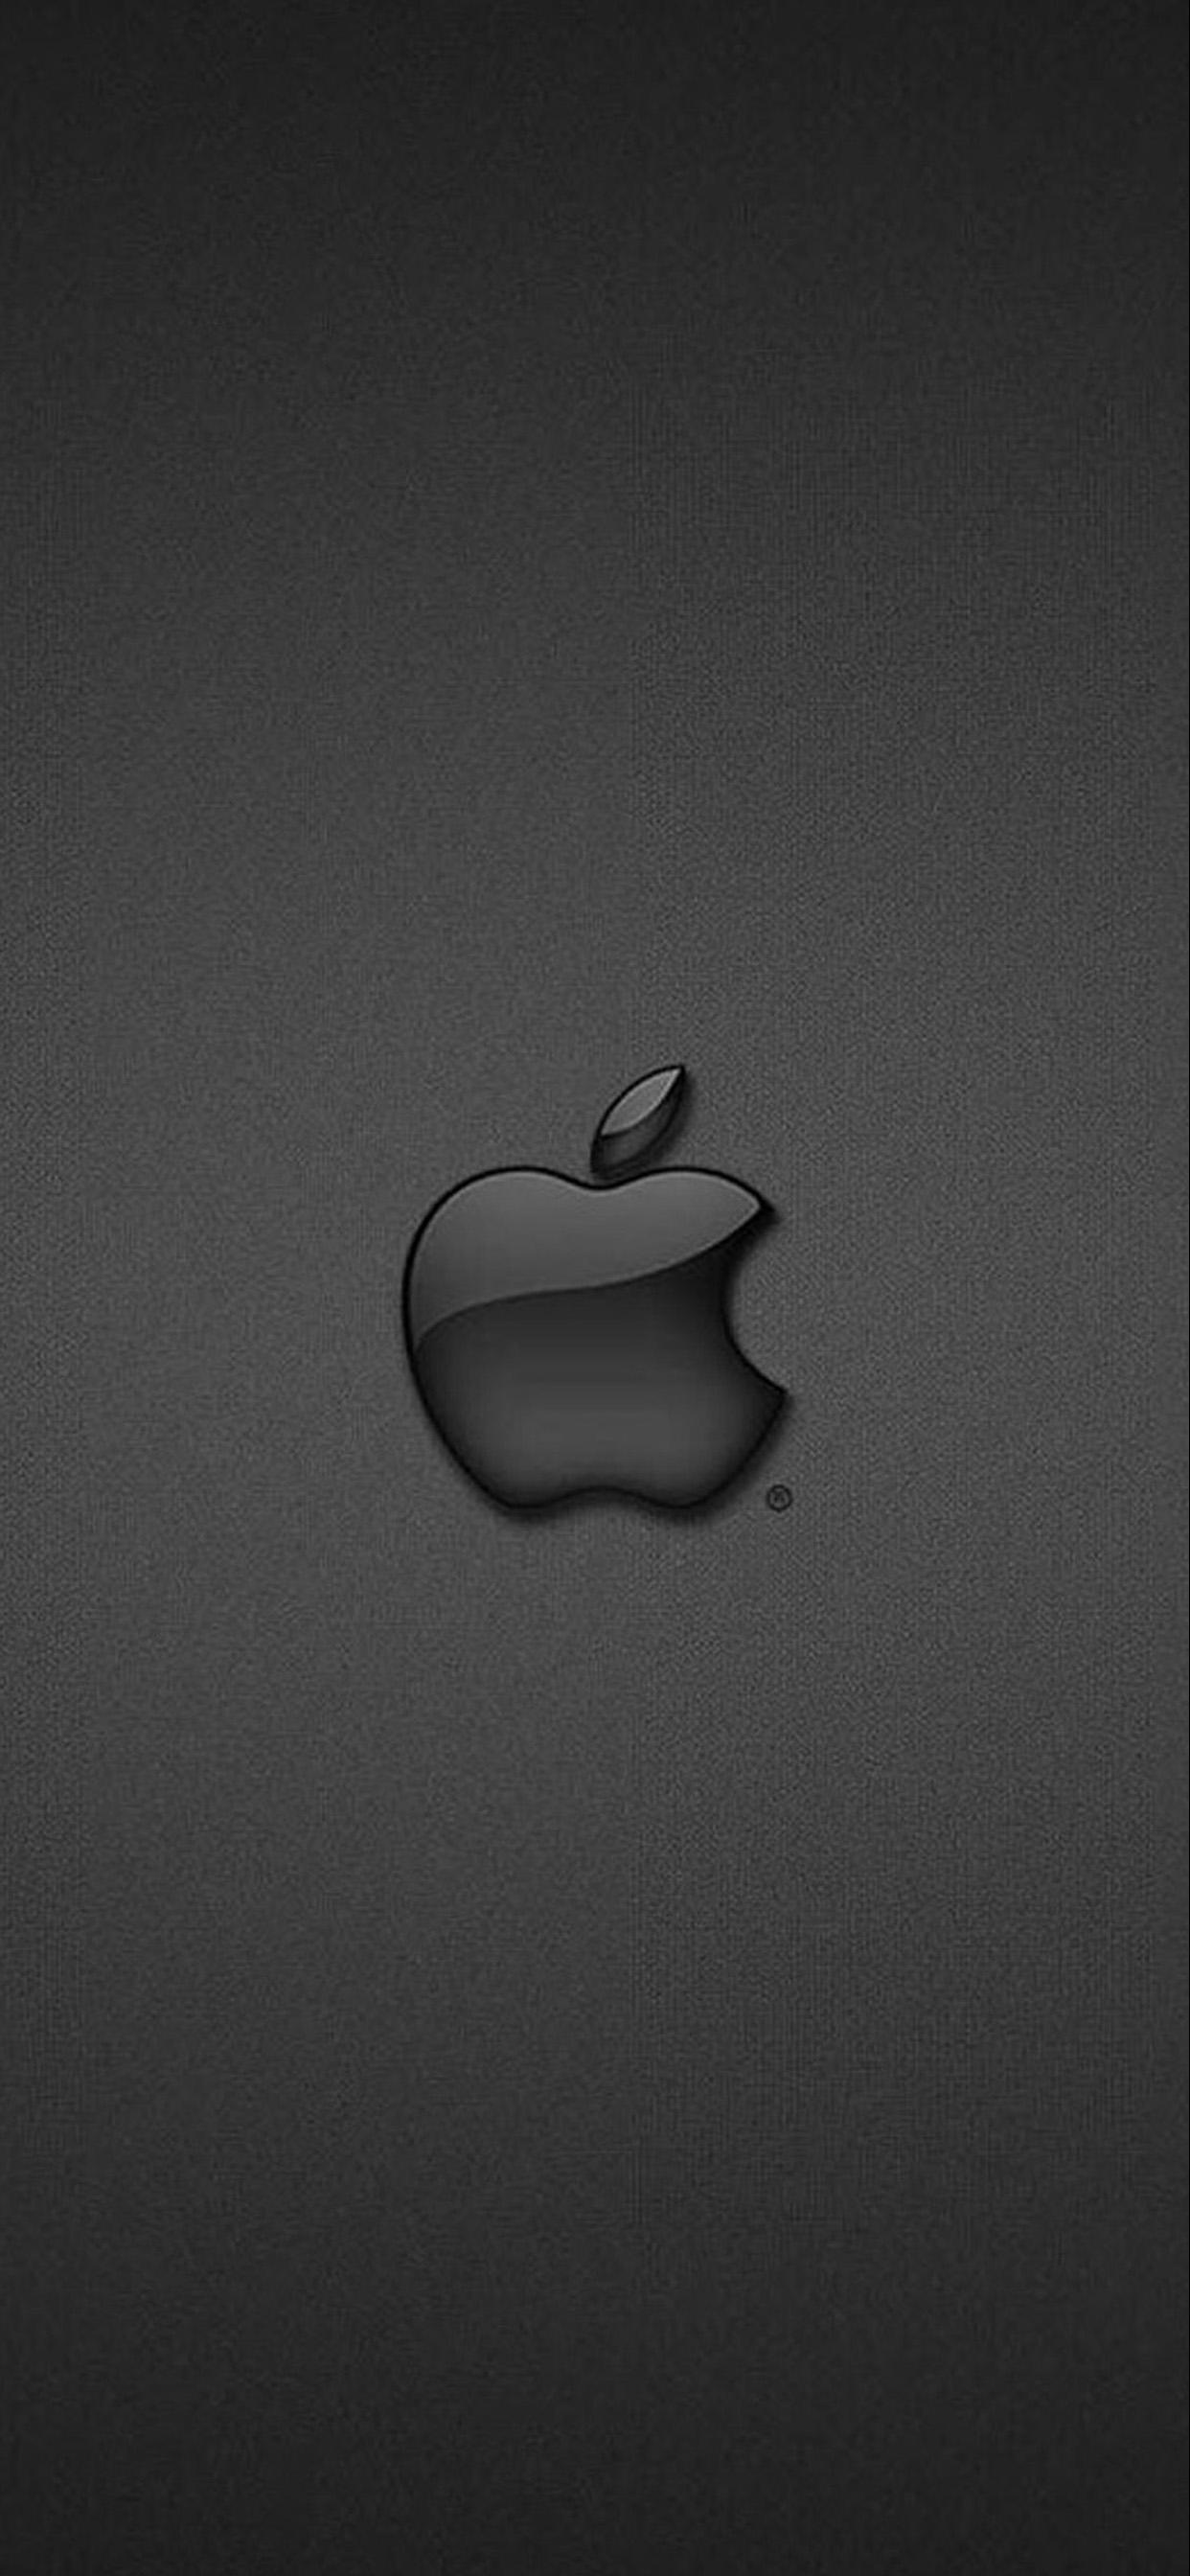 Unduh 3000+ Wallpaper Apple Iphone Xs Max HD Terbaru